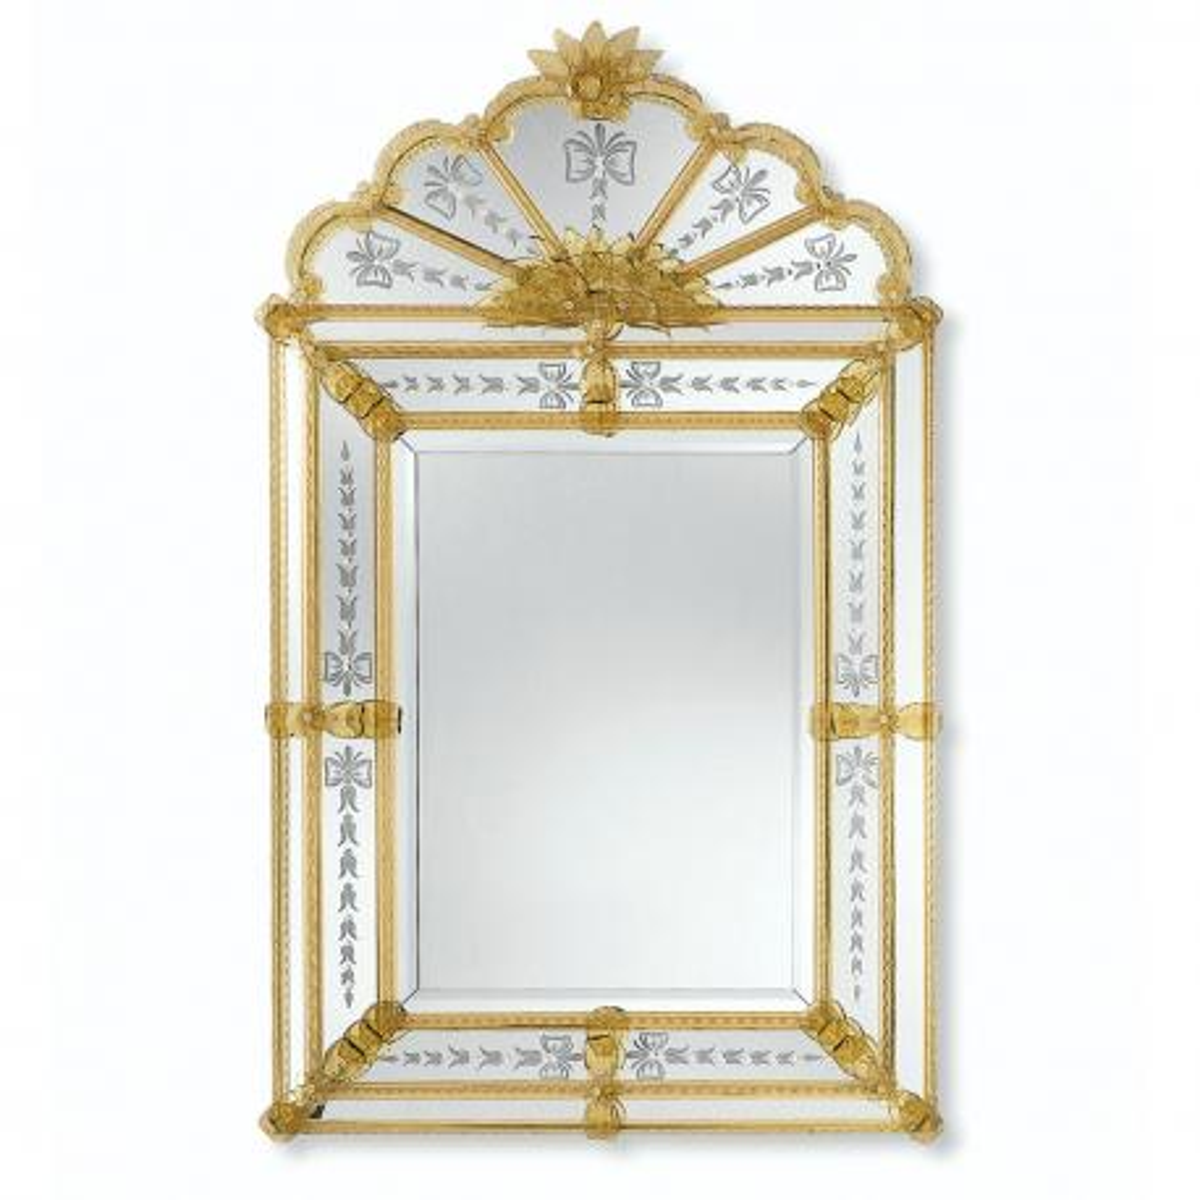 """Bernadetta"" Murano glass venetian mirror"